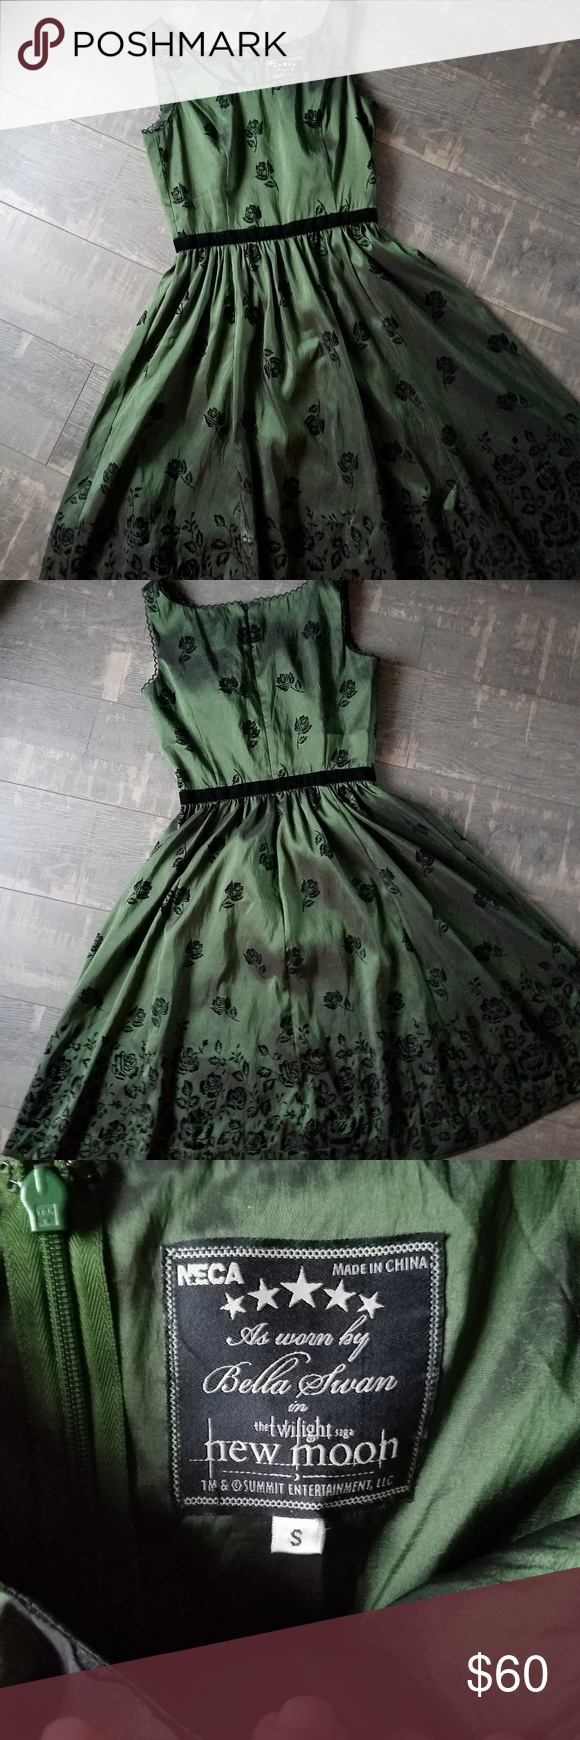 Twilight New Moon Bella Green Birthday Dress Birthday Dresses Dress Twilight Dresses [ 1740 x 580 Pixel ]